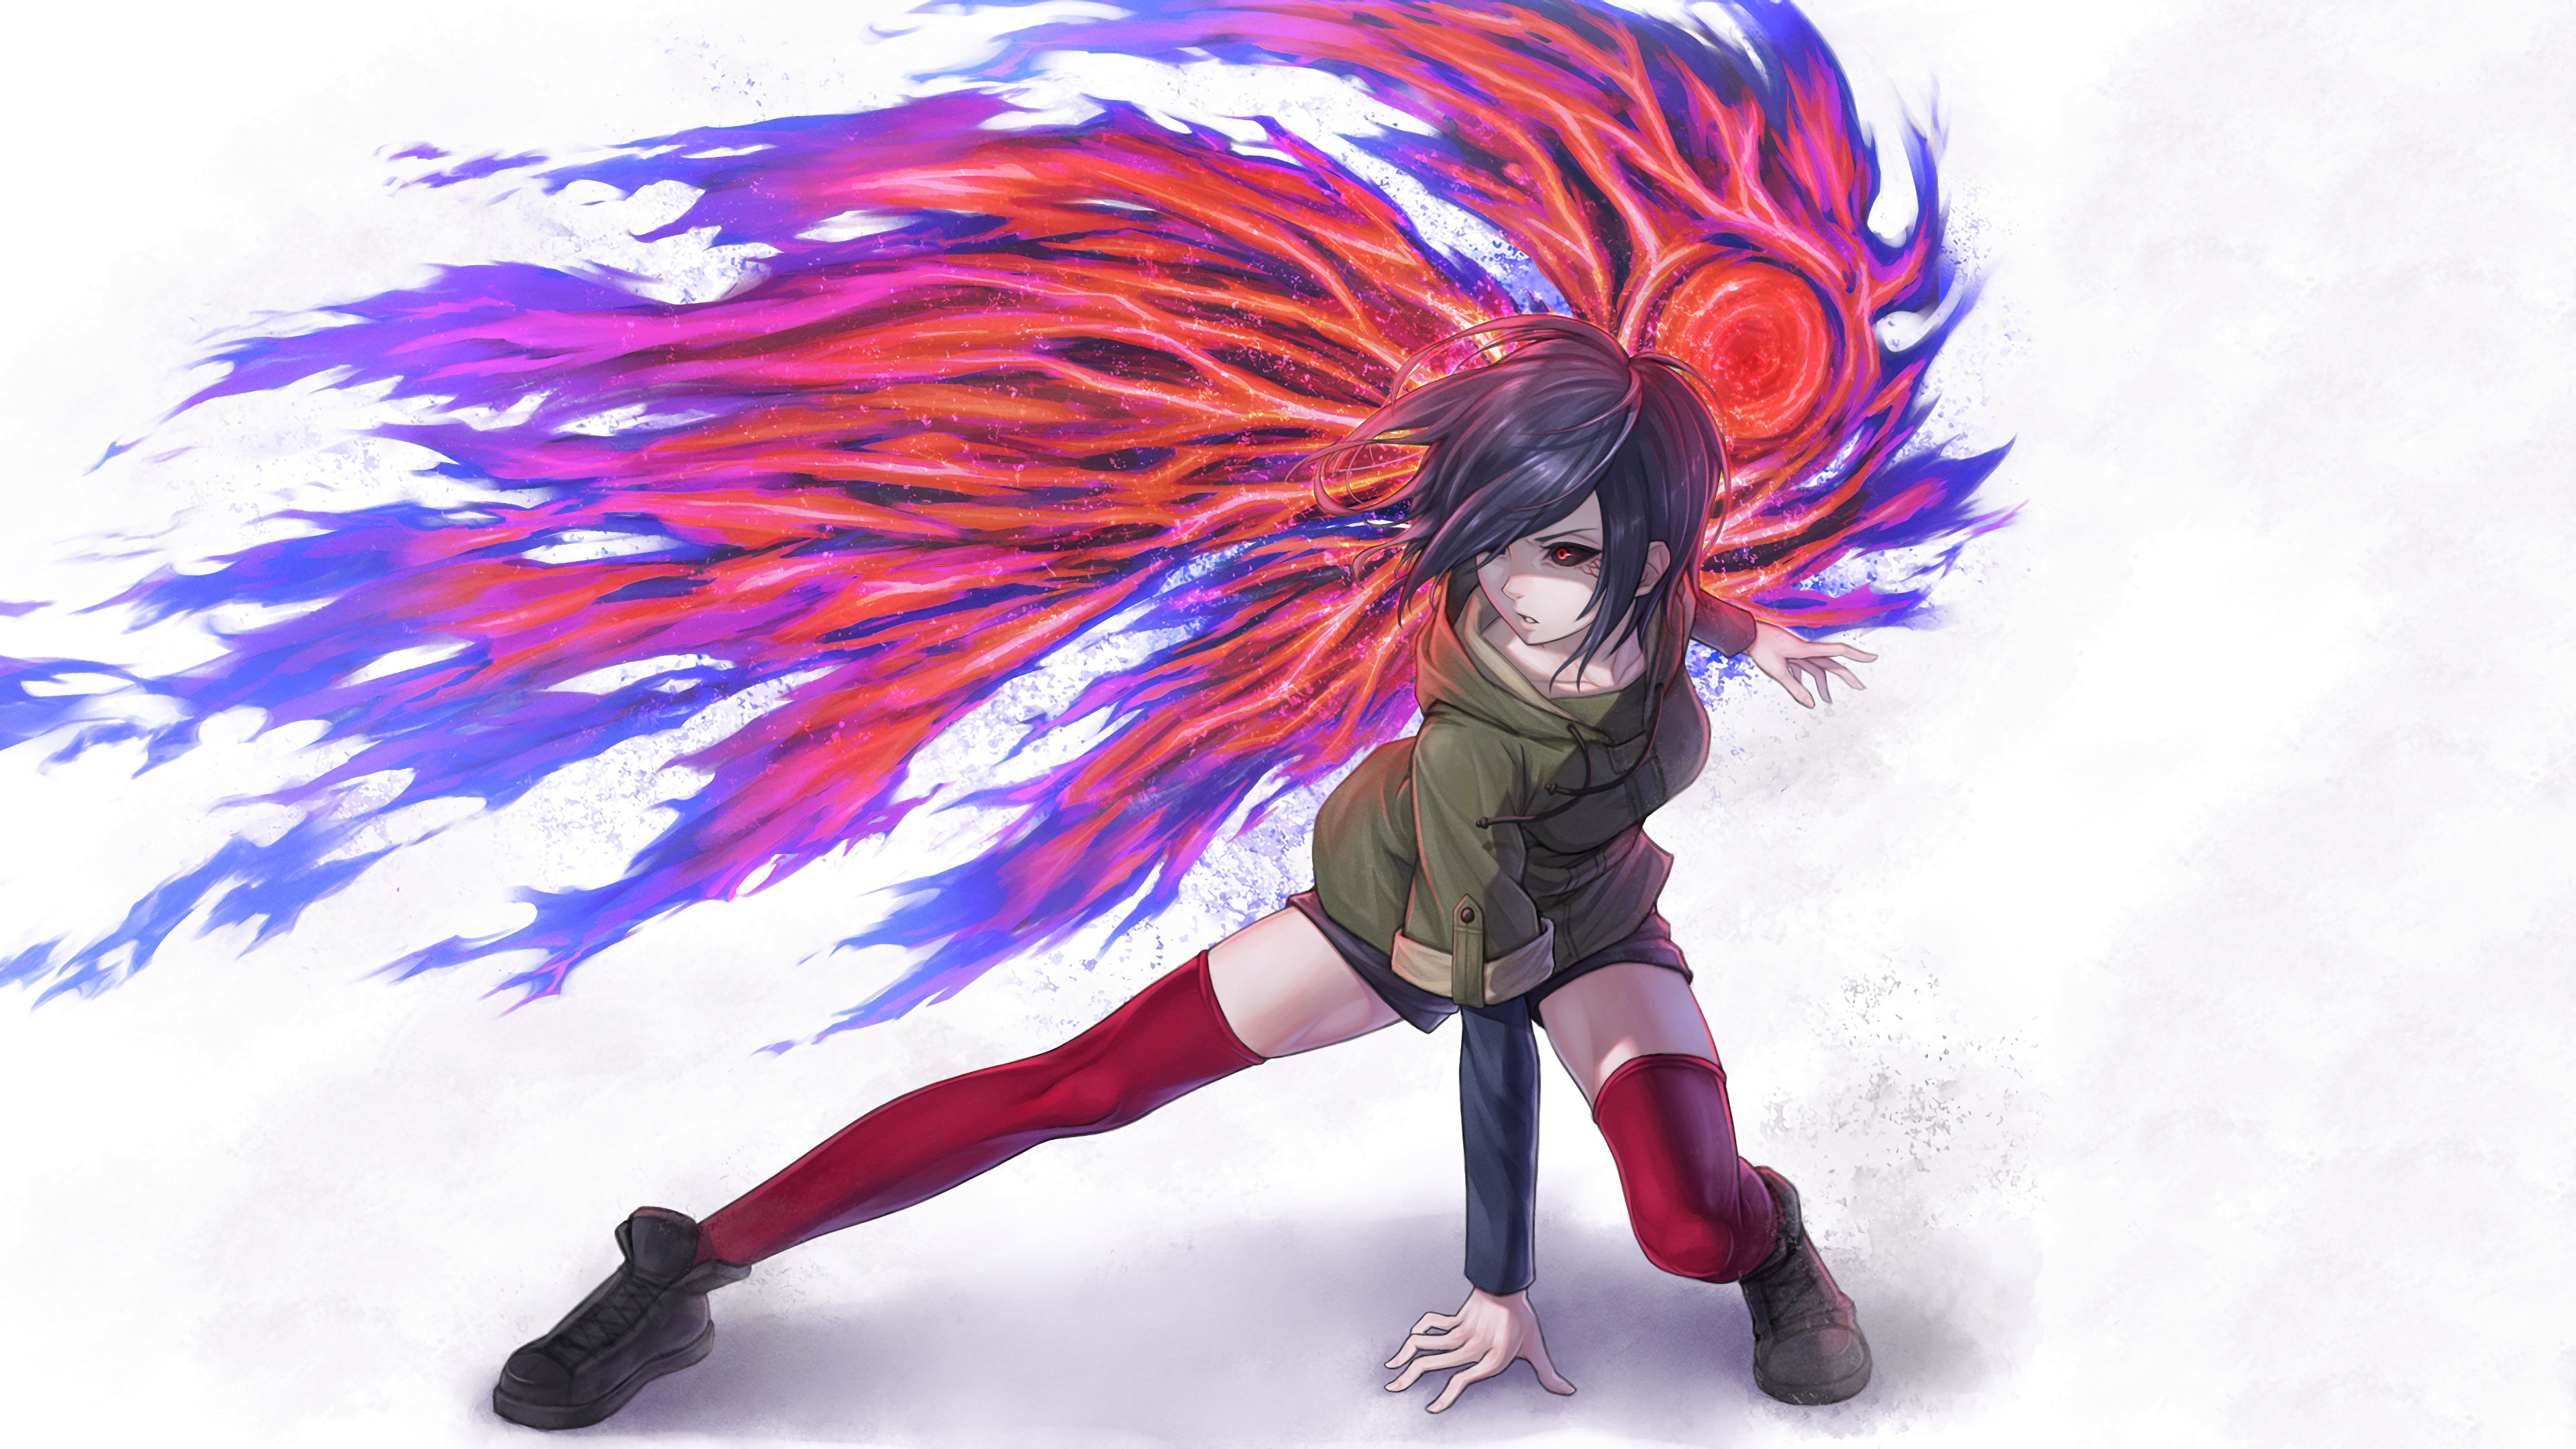 Tokyo ghoul artistic artwork 4k hd anime 4k wallpapers - Anime background wallpaper 4k ...